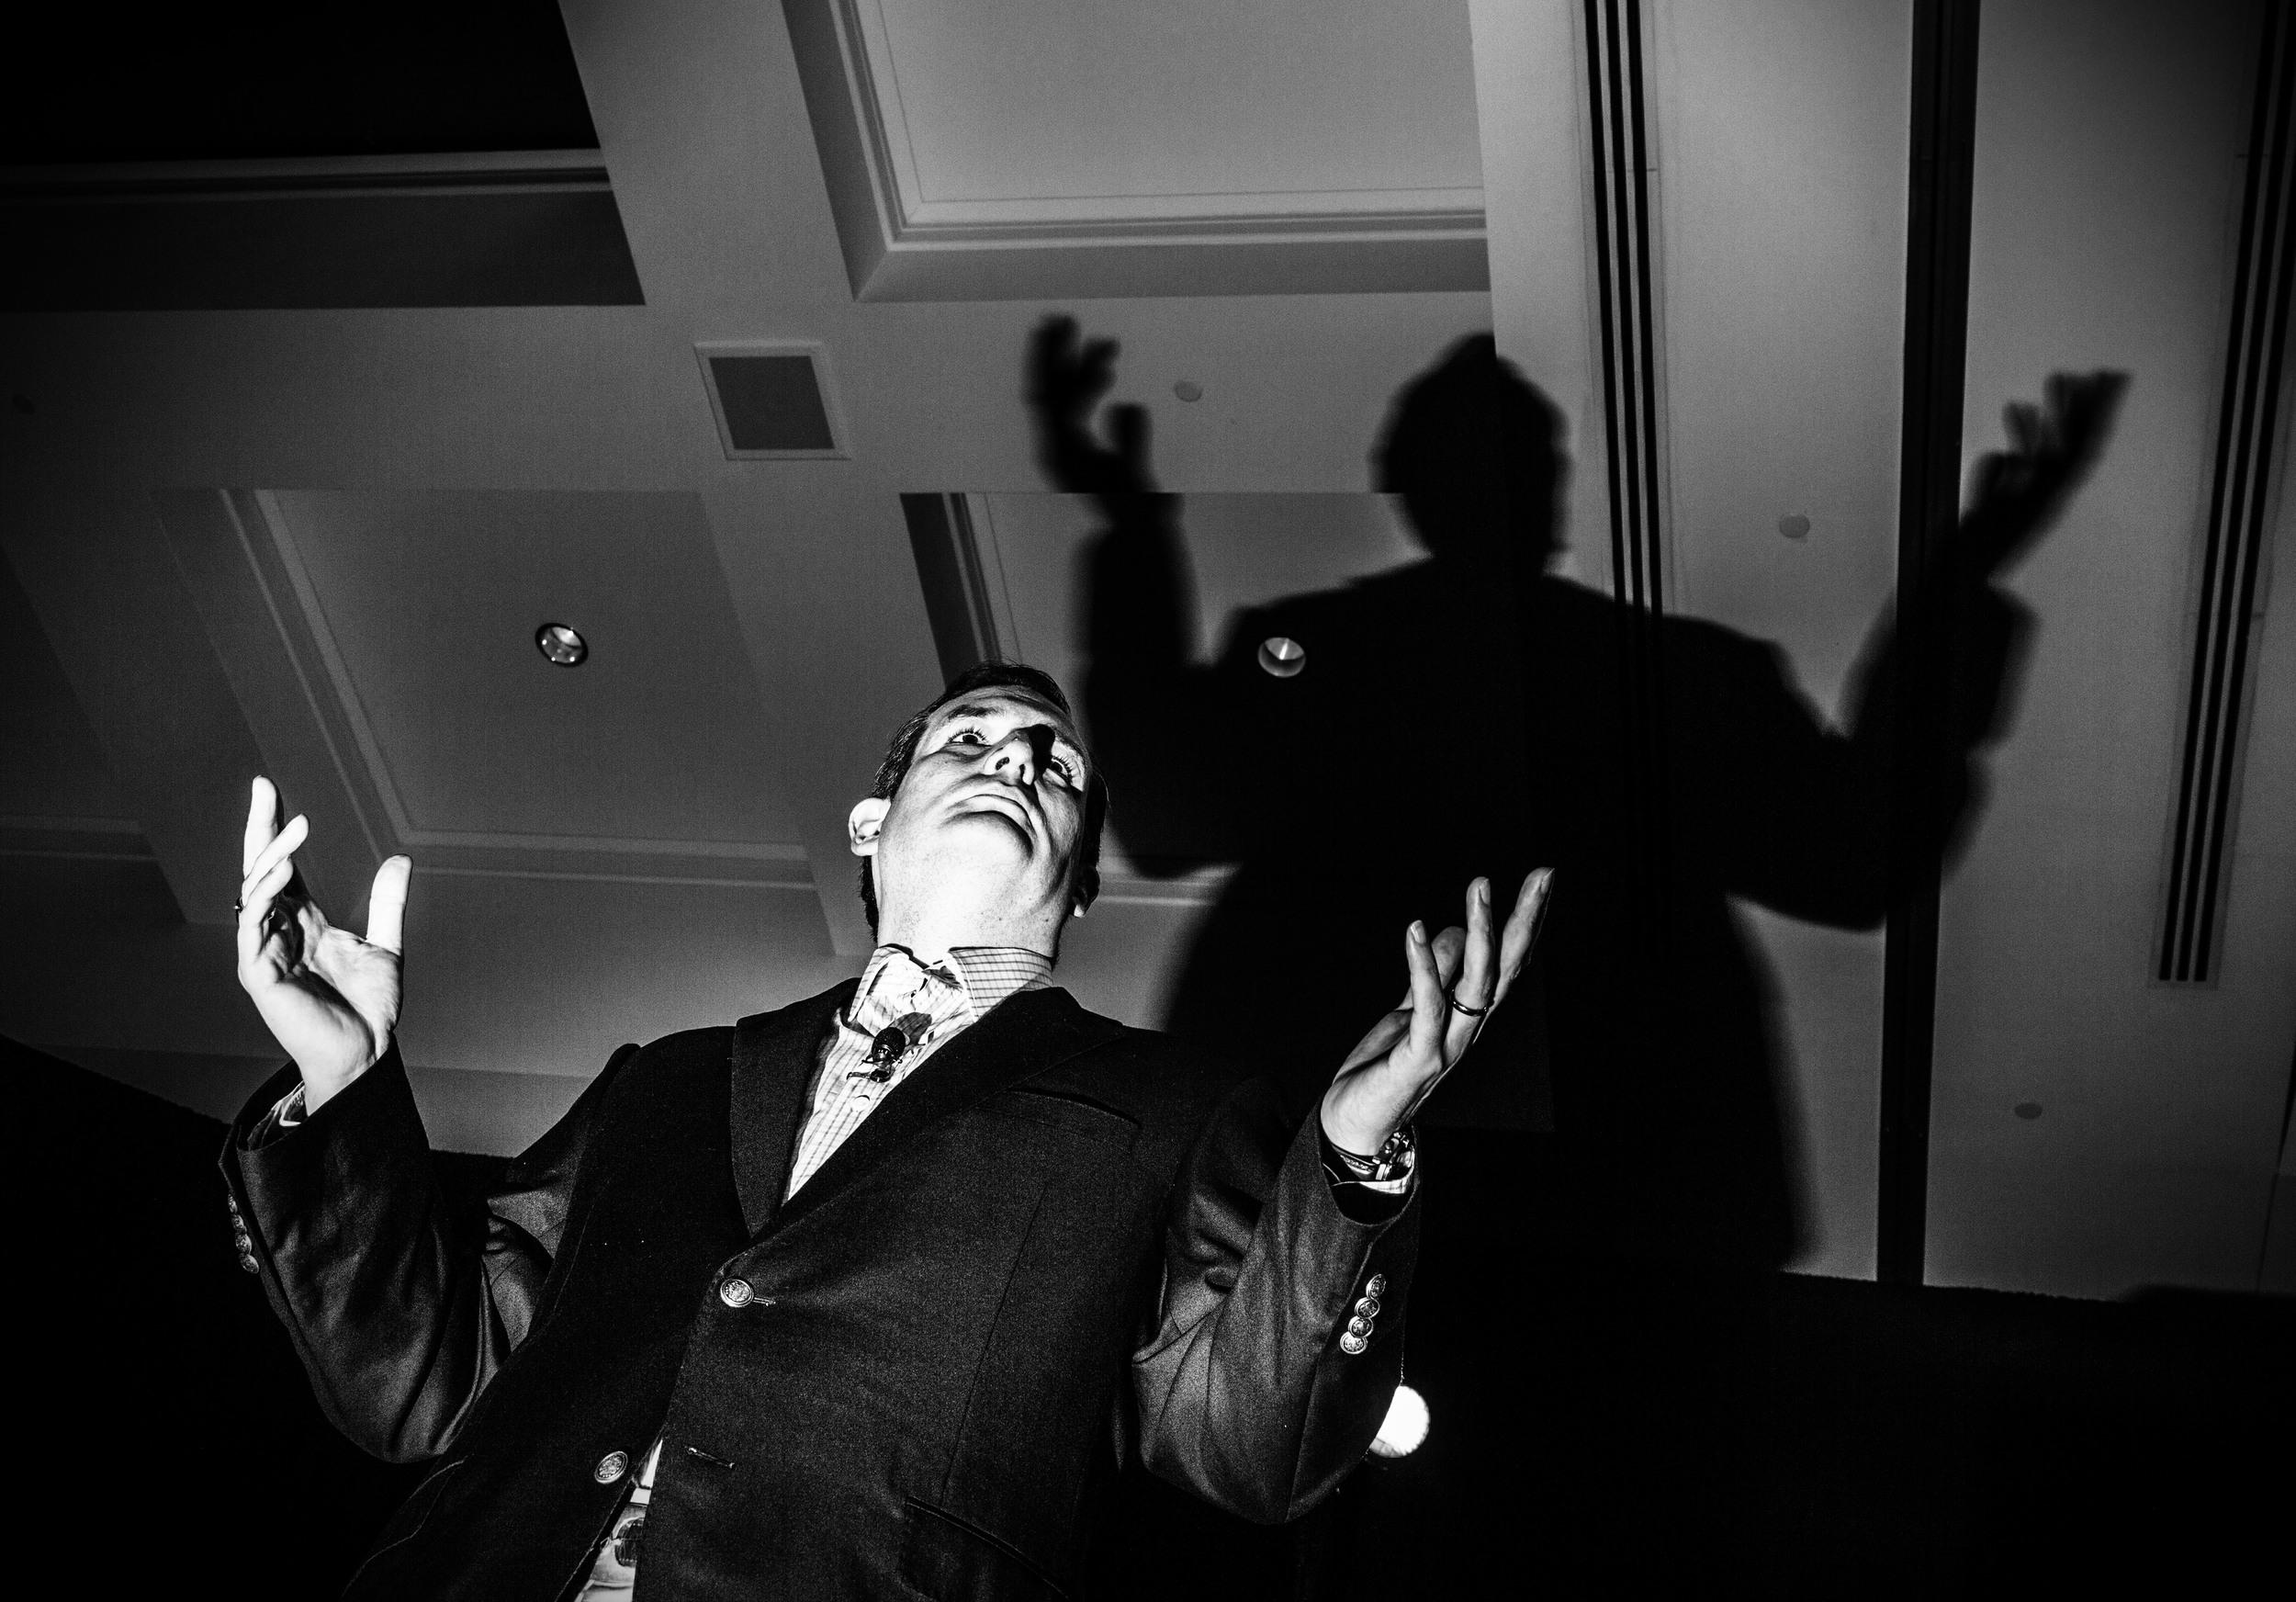 Politics in Black & White:   Ted Cruz casting shadows in Atlanta. © Mark Peterson/   ReduxPictures